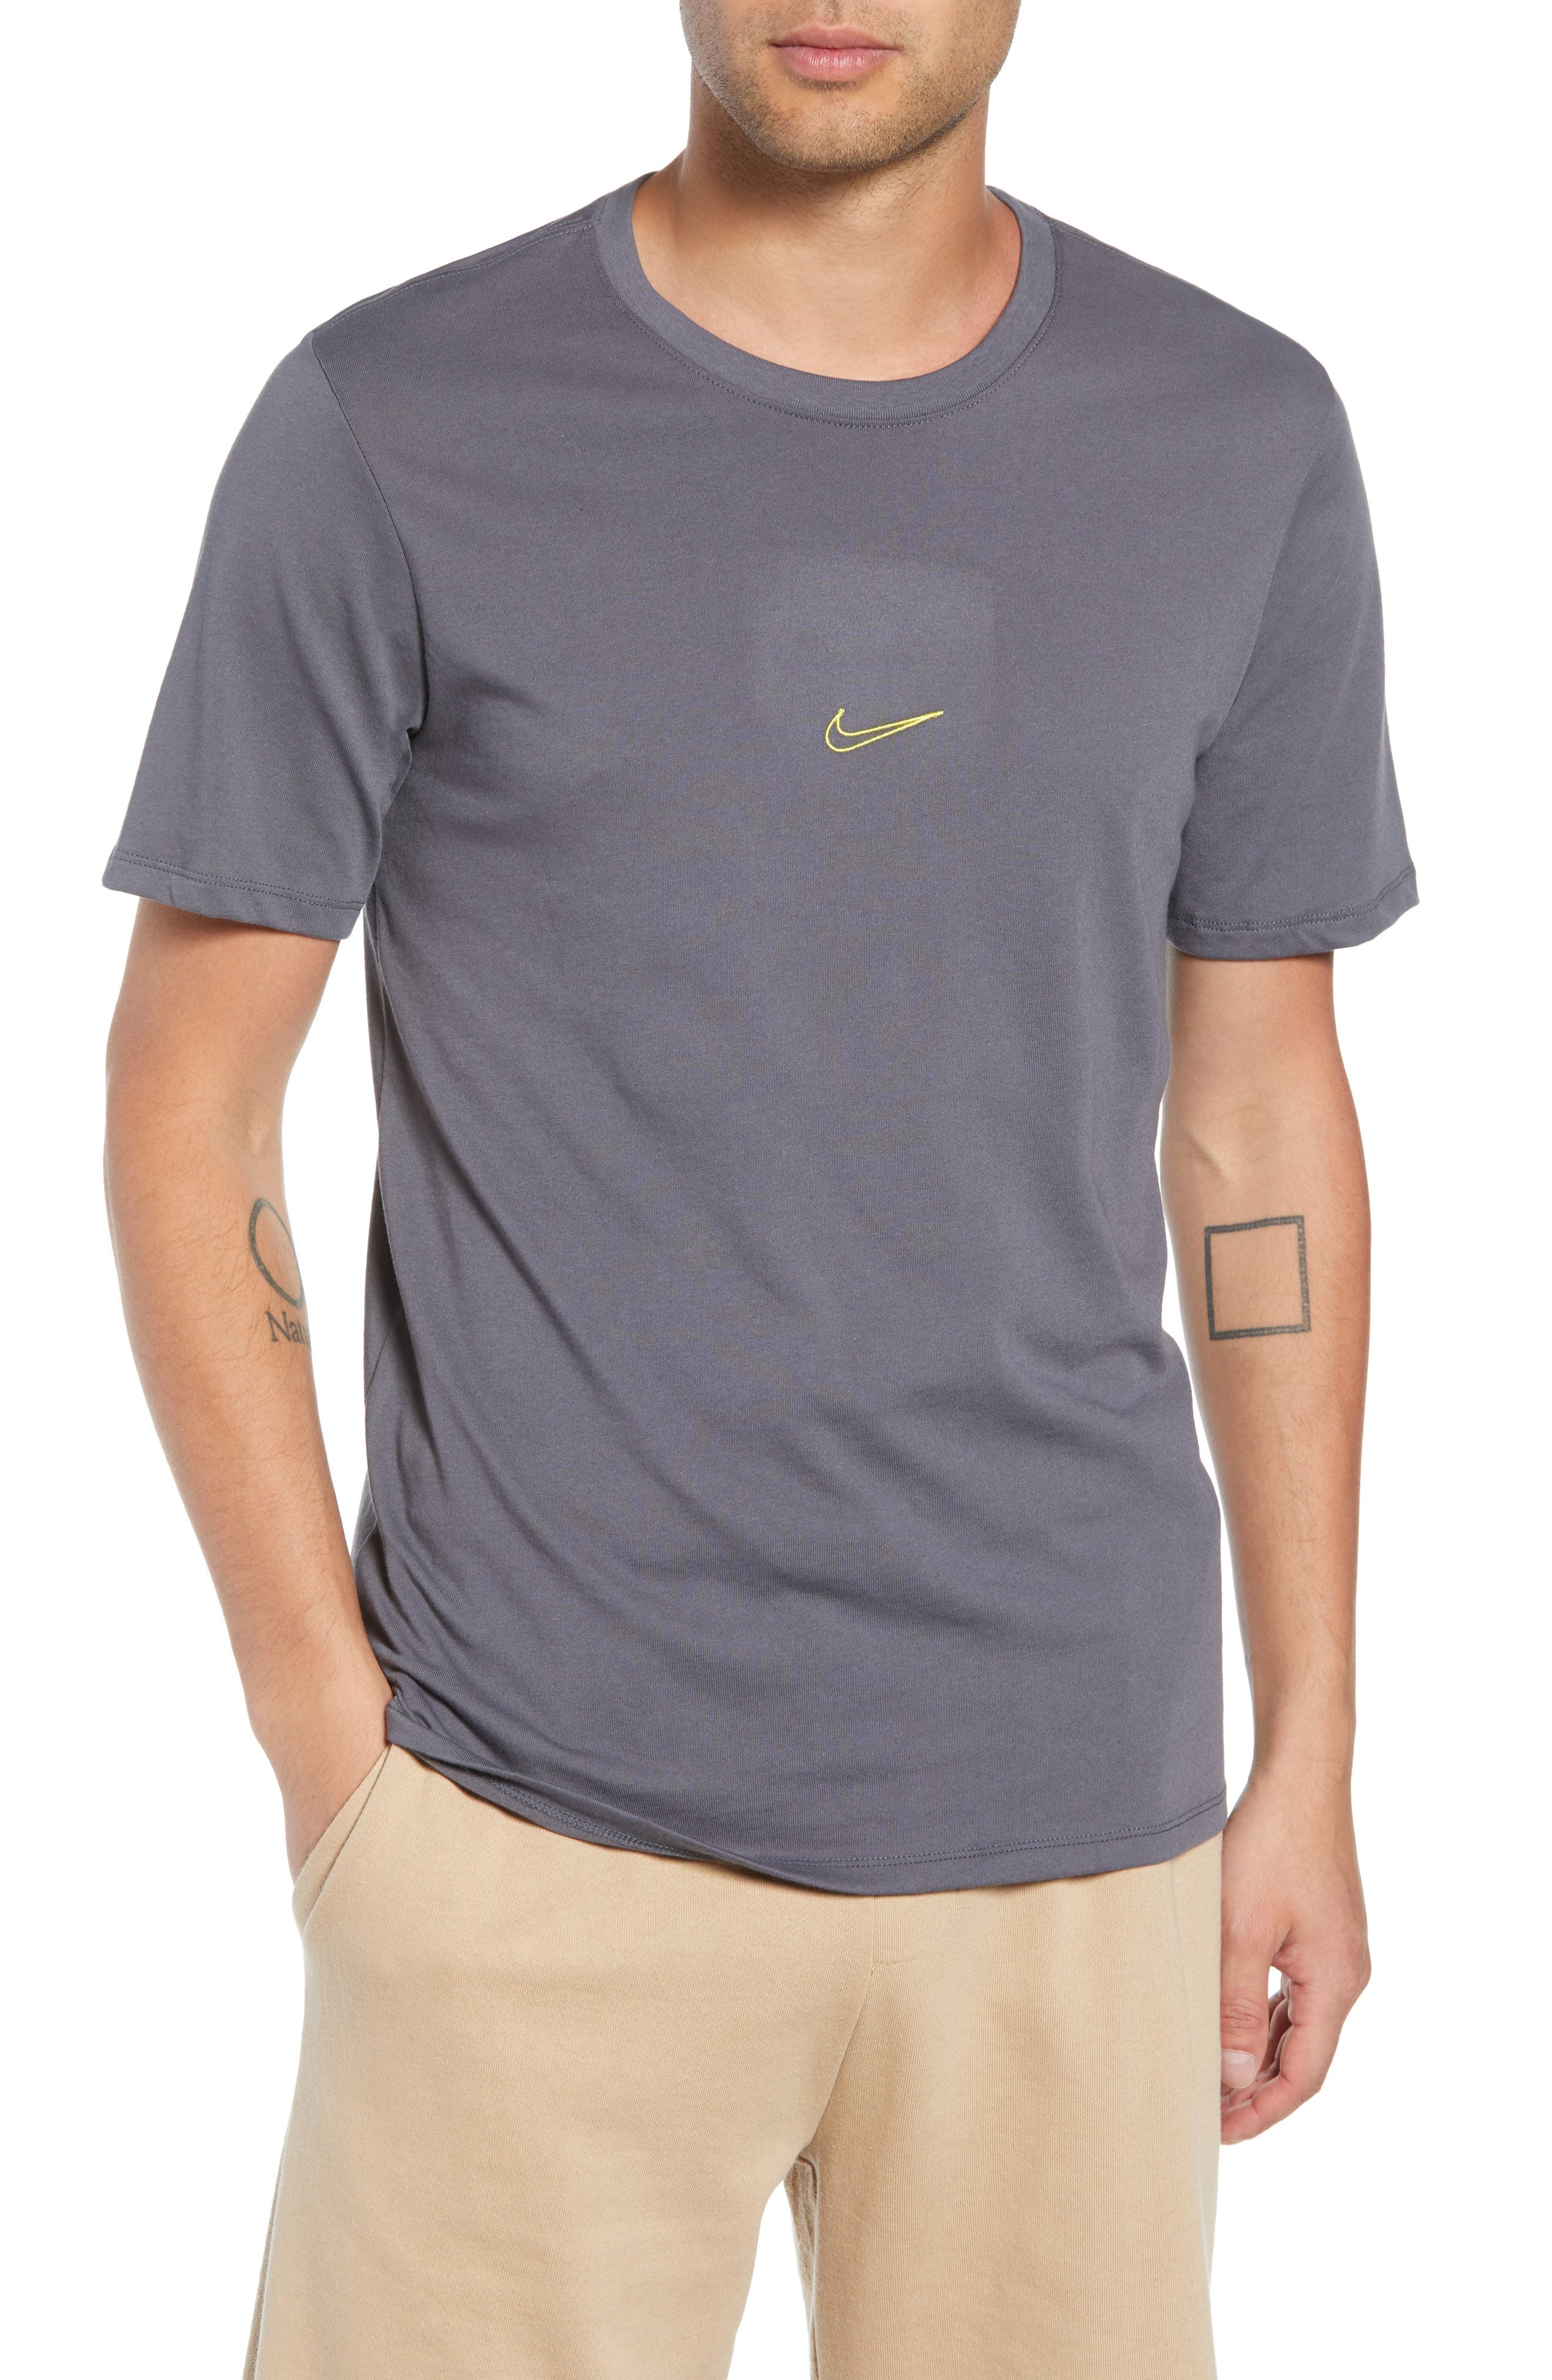 SB Dry Tropical Graphic T-Shirt,                             Main thumbnail 1, color,                             DARK GREY/ DYNAMIC YELLOW